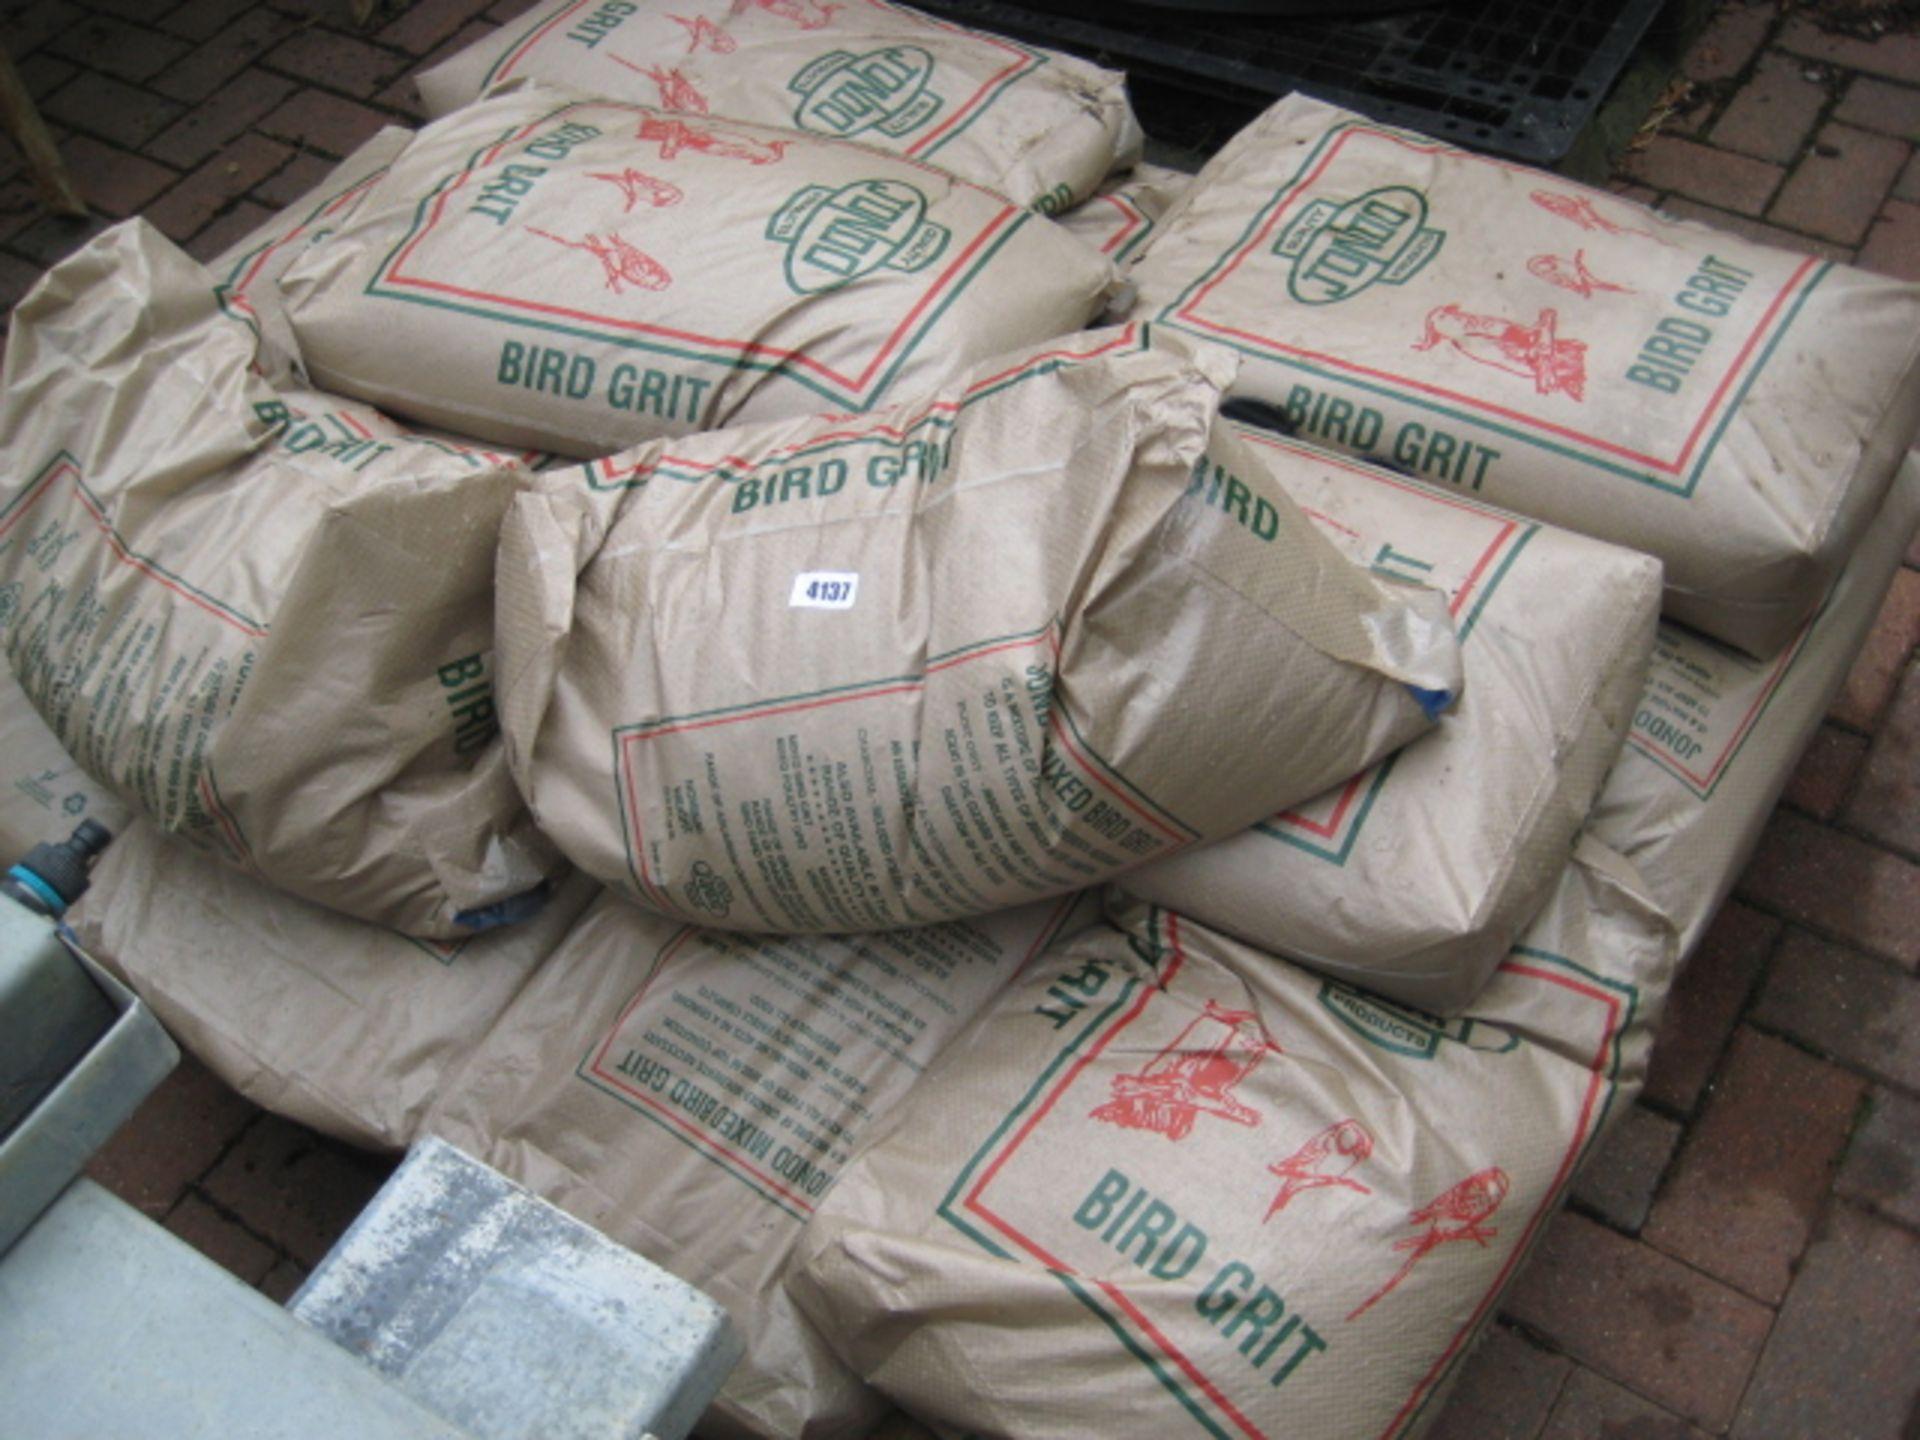 Lot 4137 - Pallet of 25kg bags of Jondo bird grit